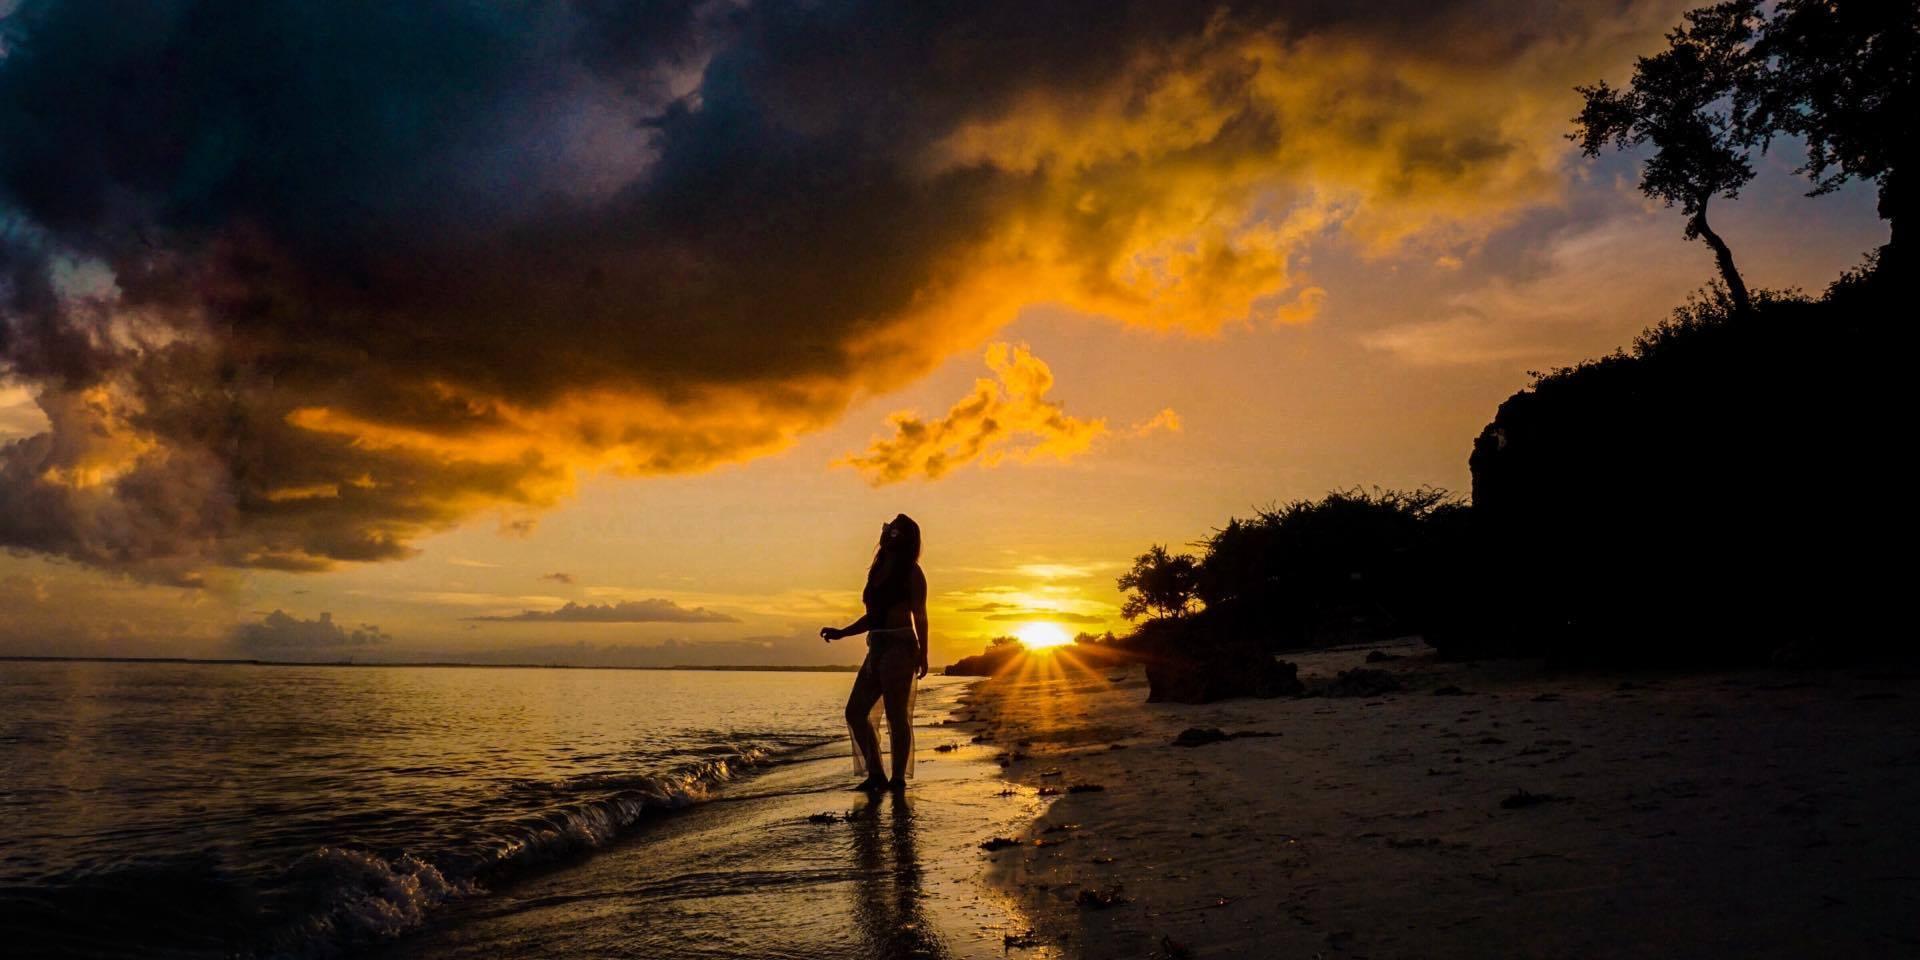 Sunset at Paradise Beach Bantayan Island, Cebu